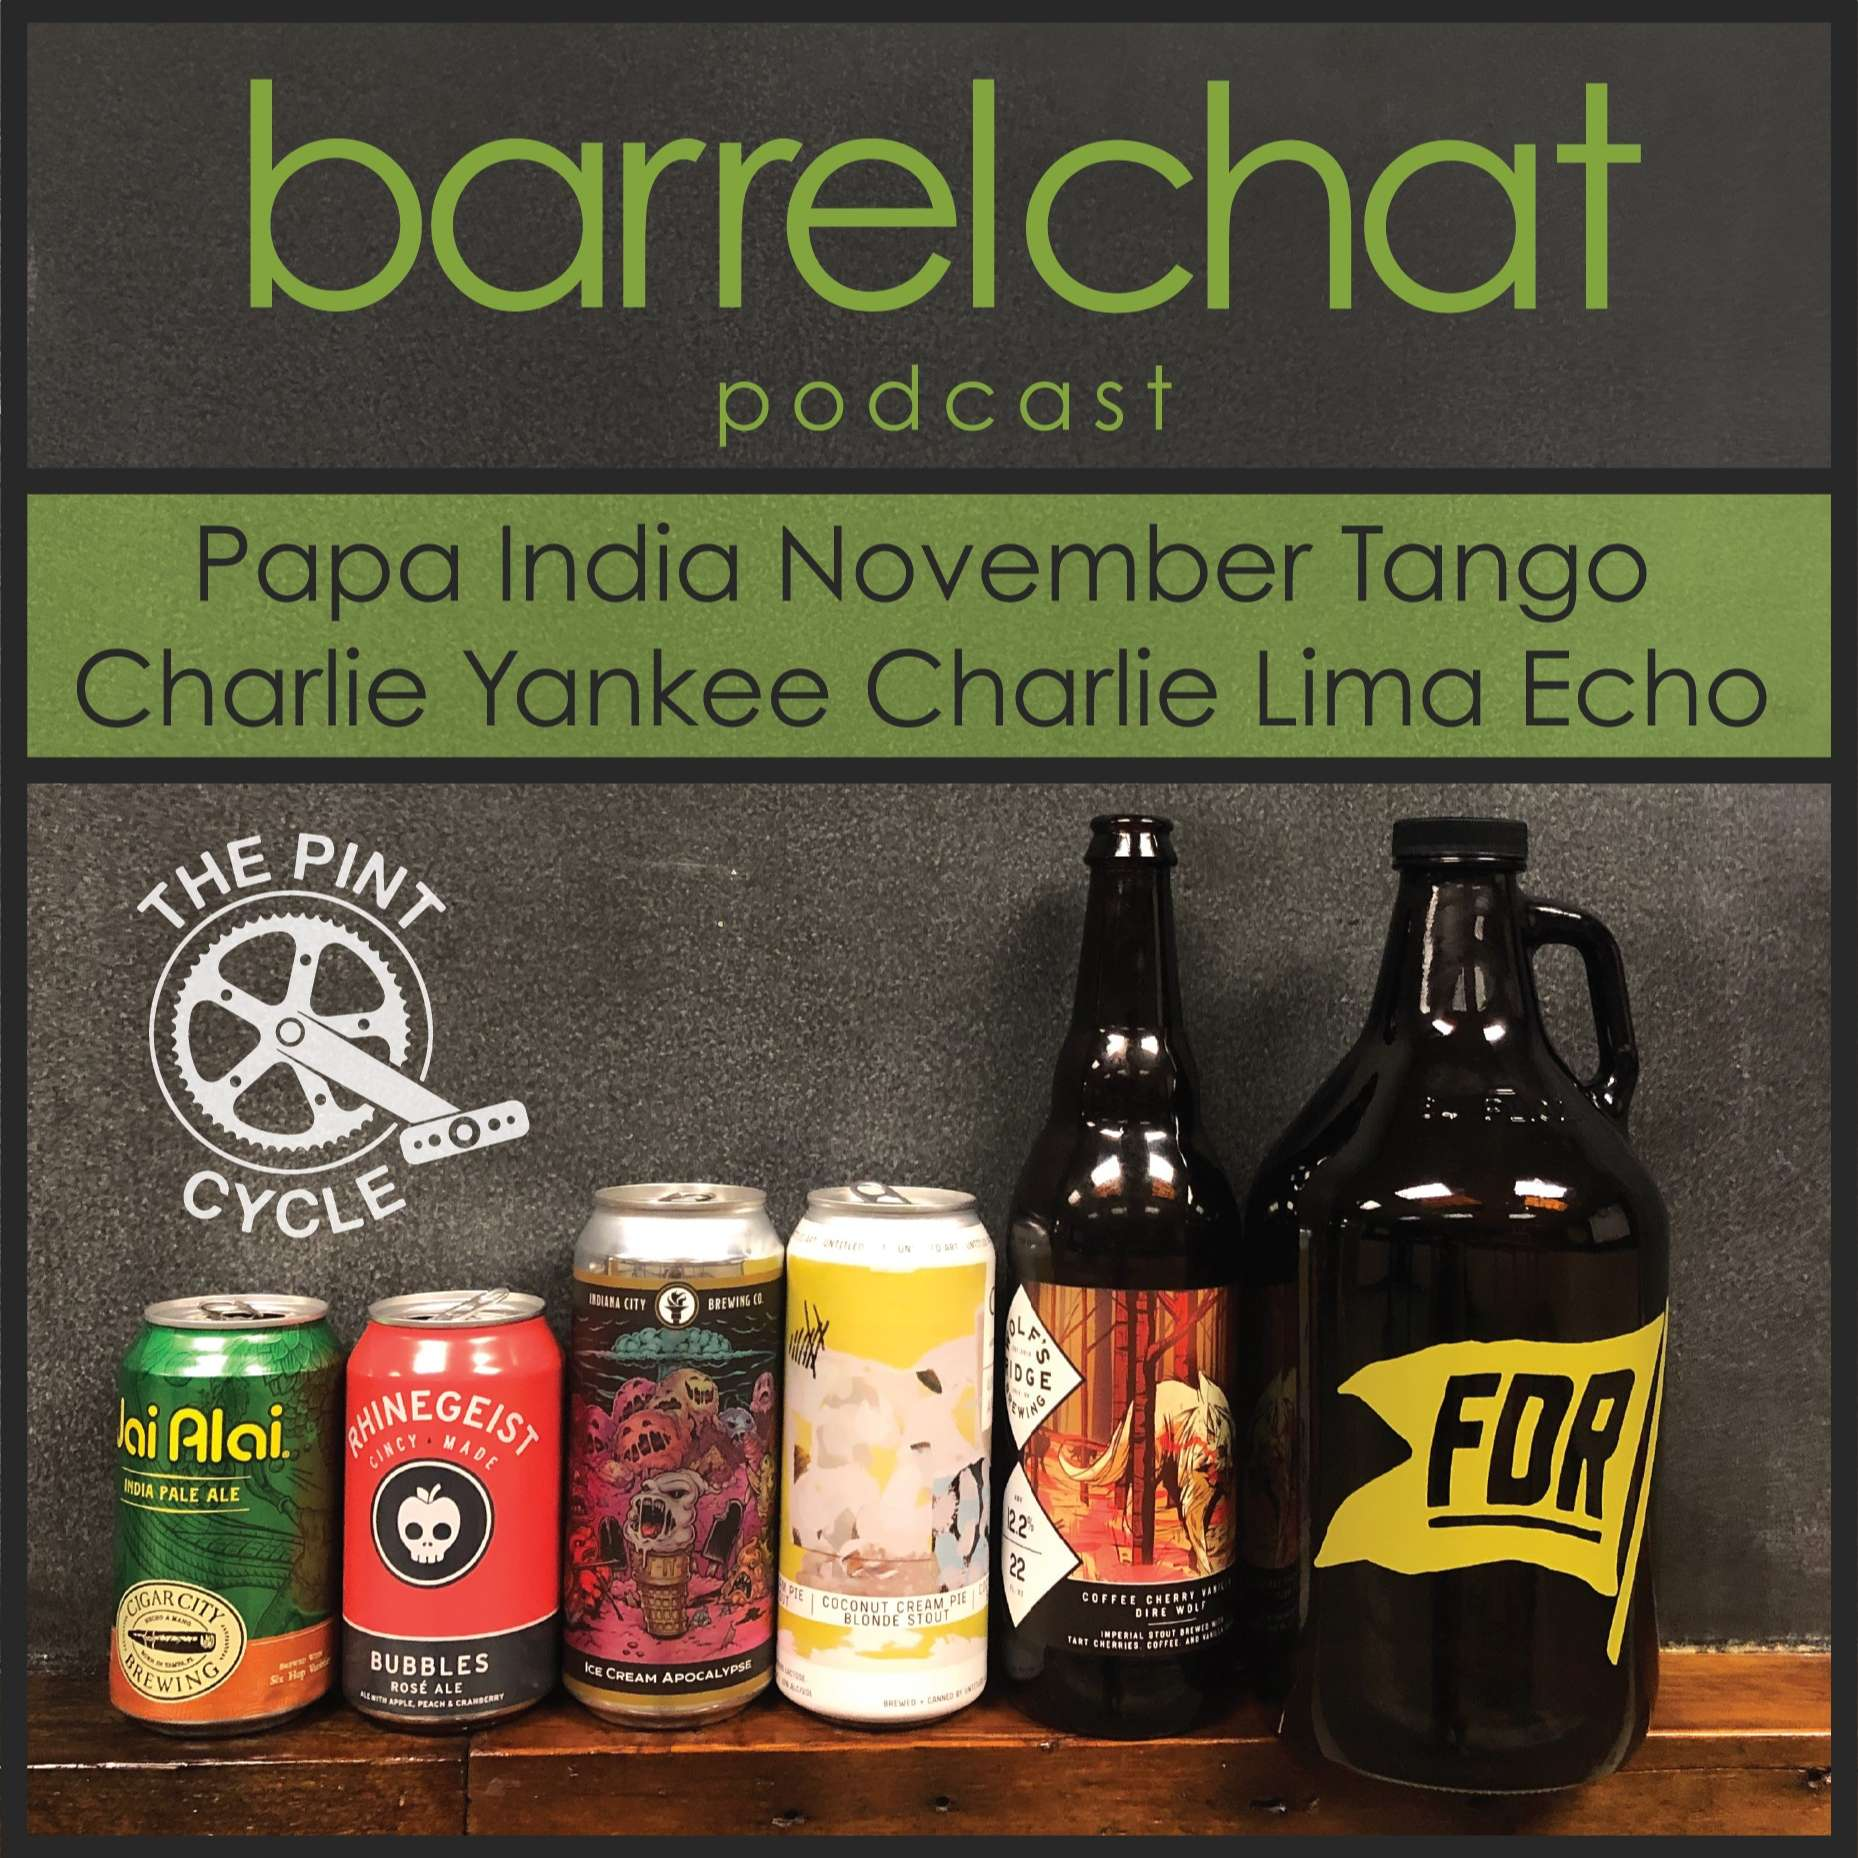 Papa India November Tango   Charlie Yankee Charlie Lima Echo